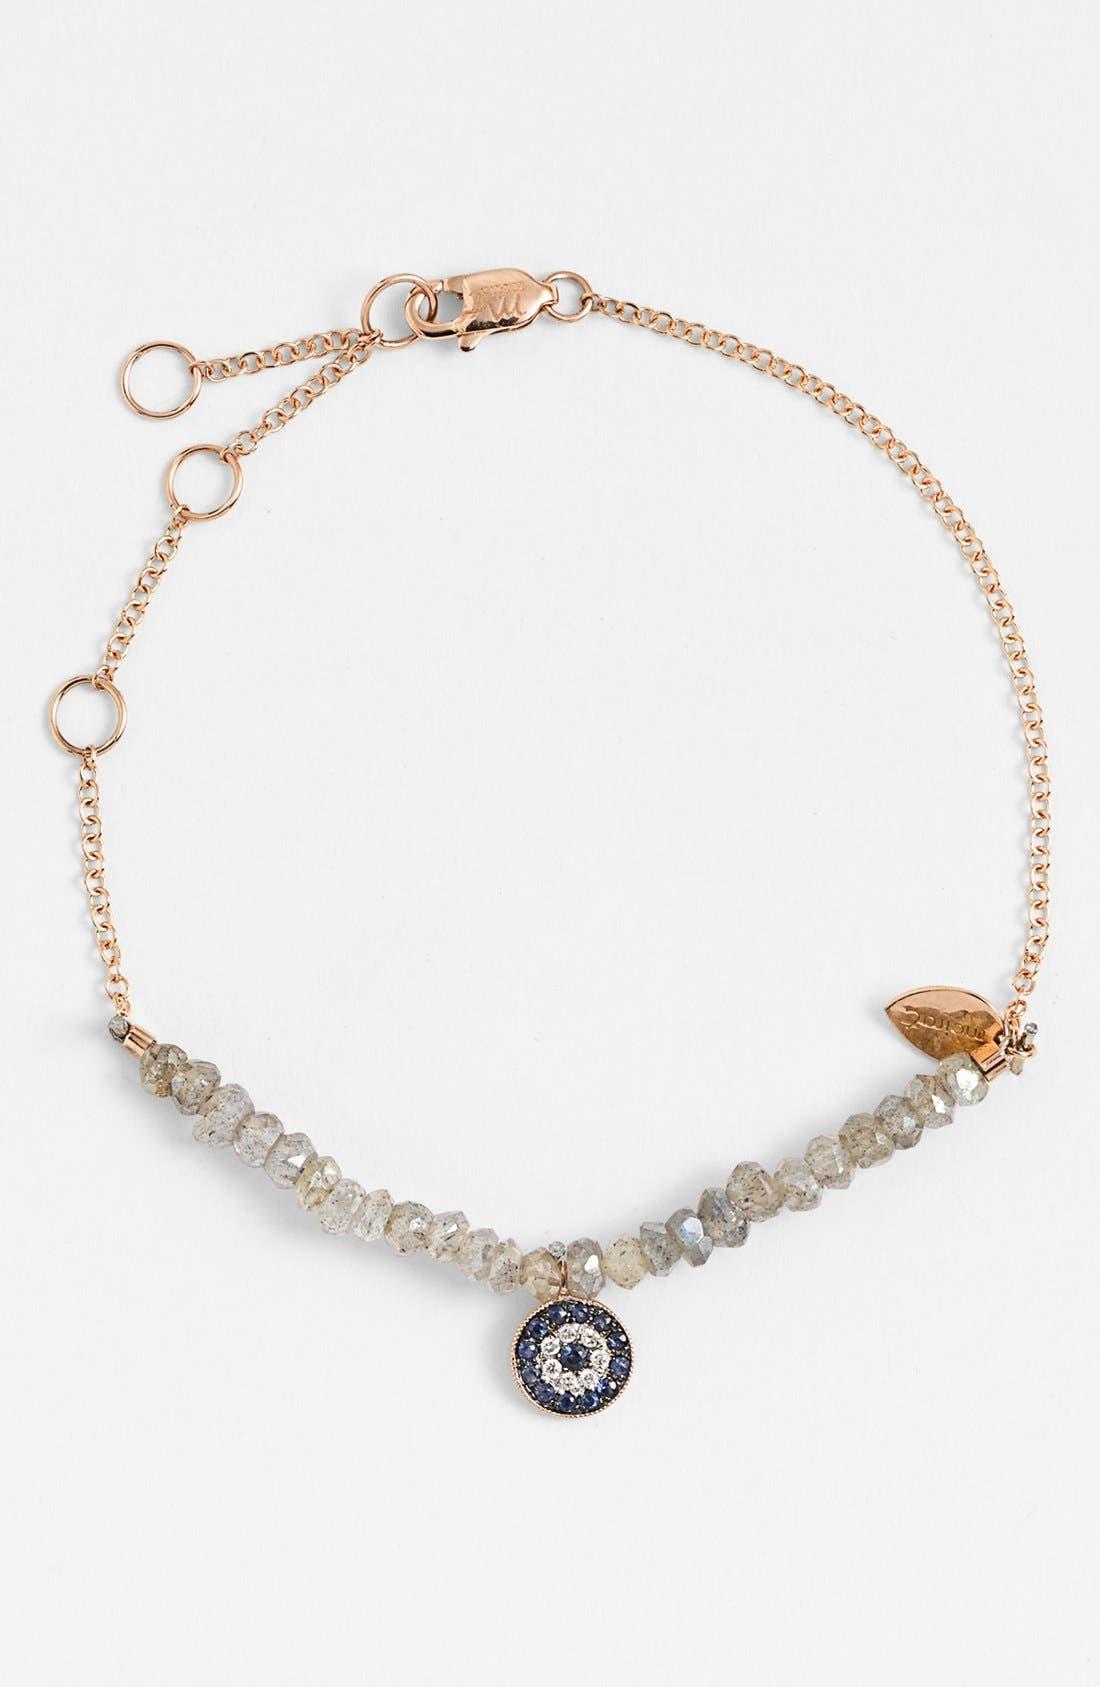 Alternate Image 1 Selected - MeiraT 'Desert Infusion' Diamond, Sapphire & Stone Bracelet